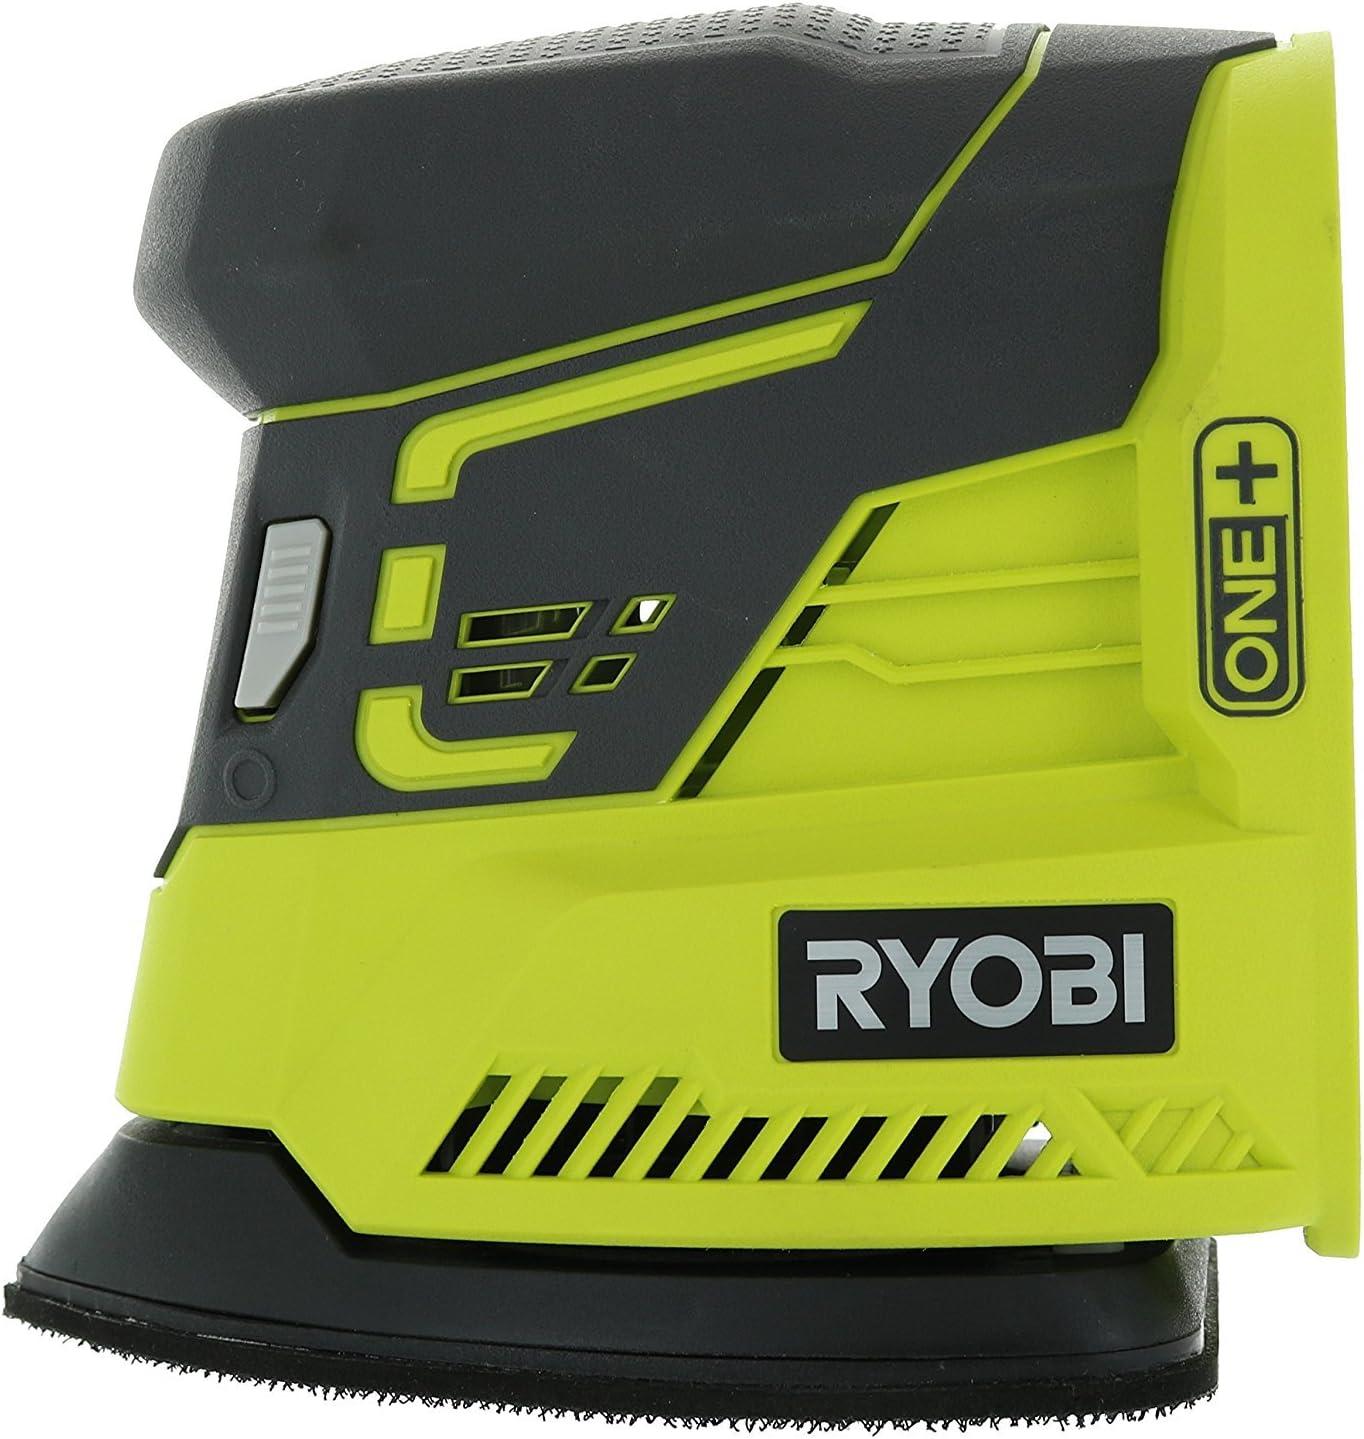 Ryobi P401 featured image 1